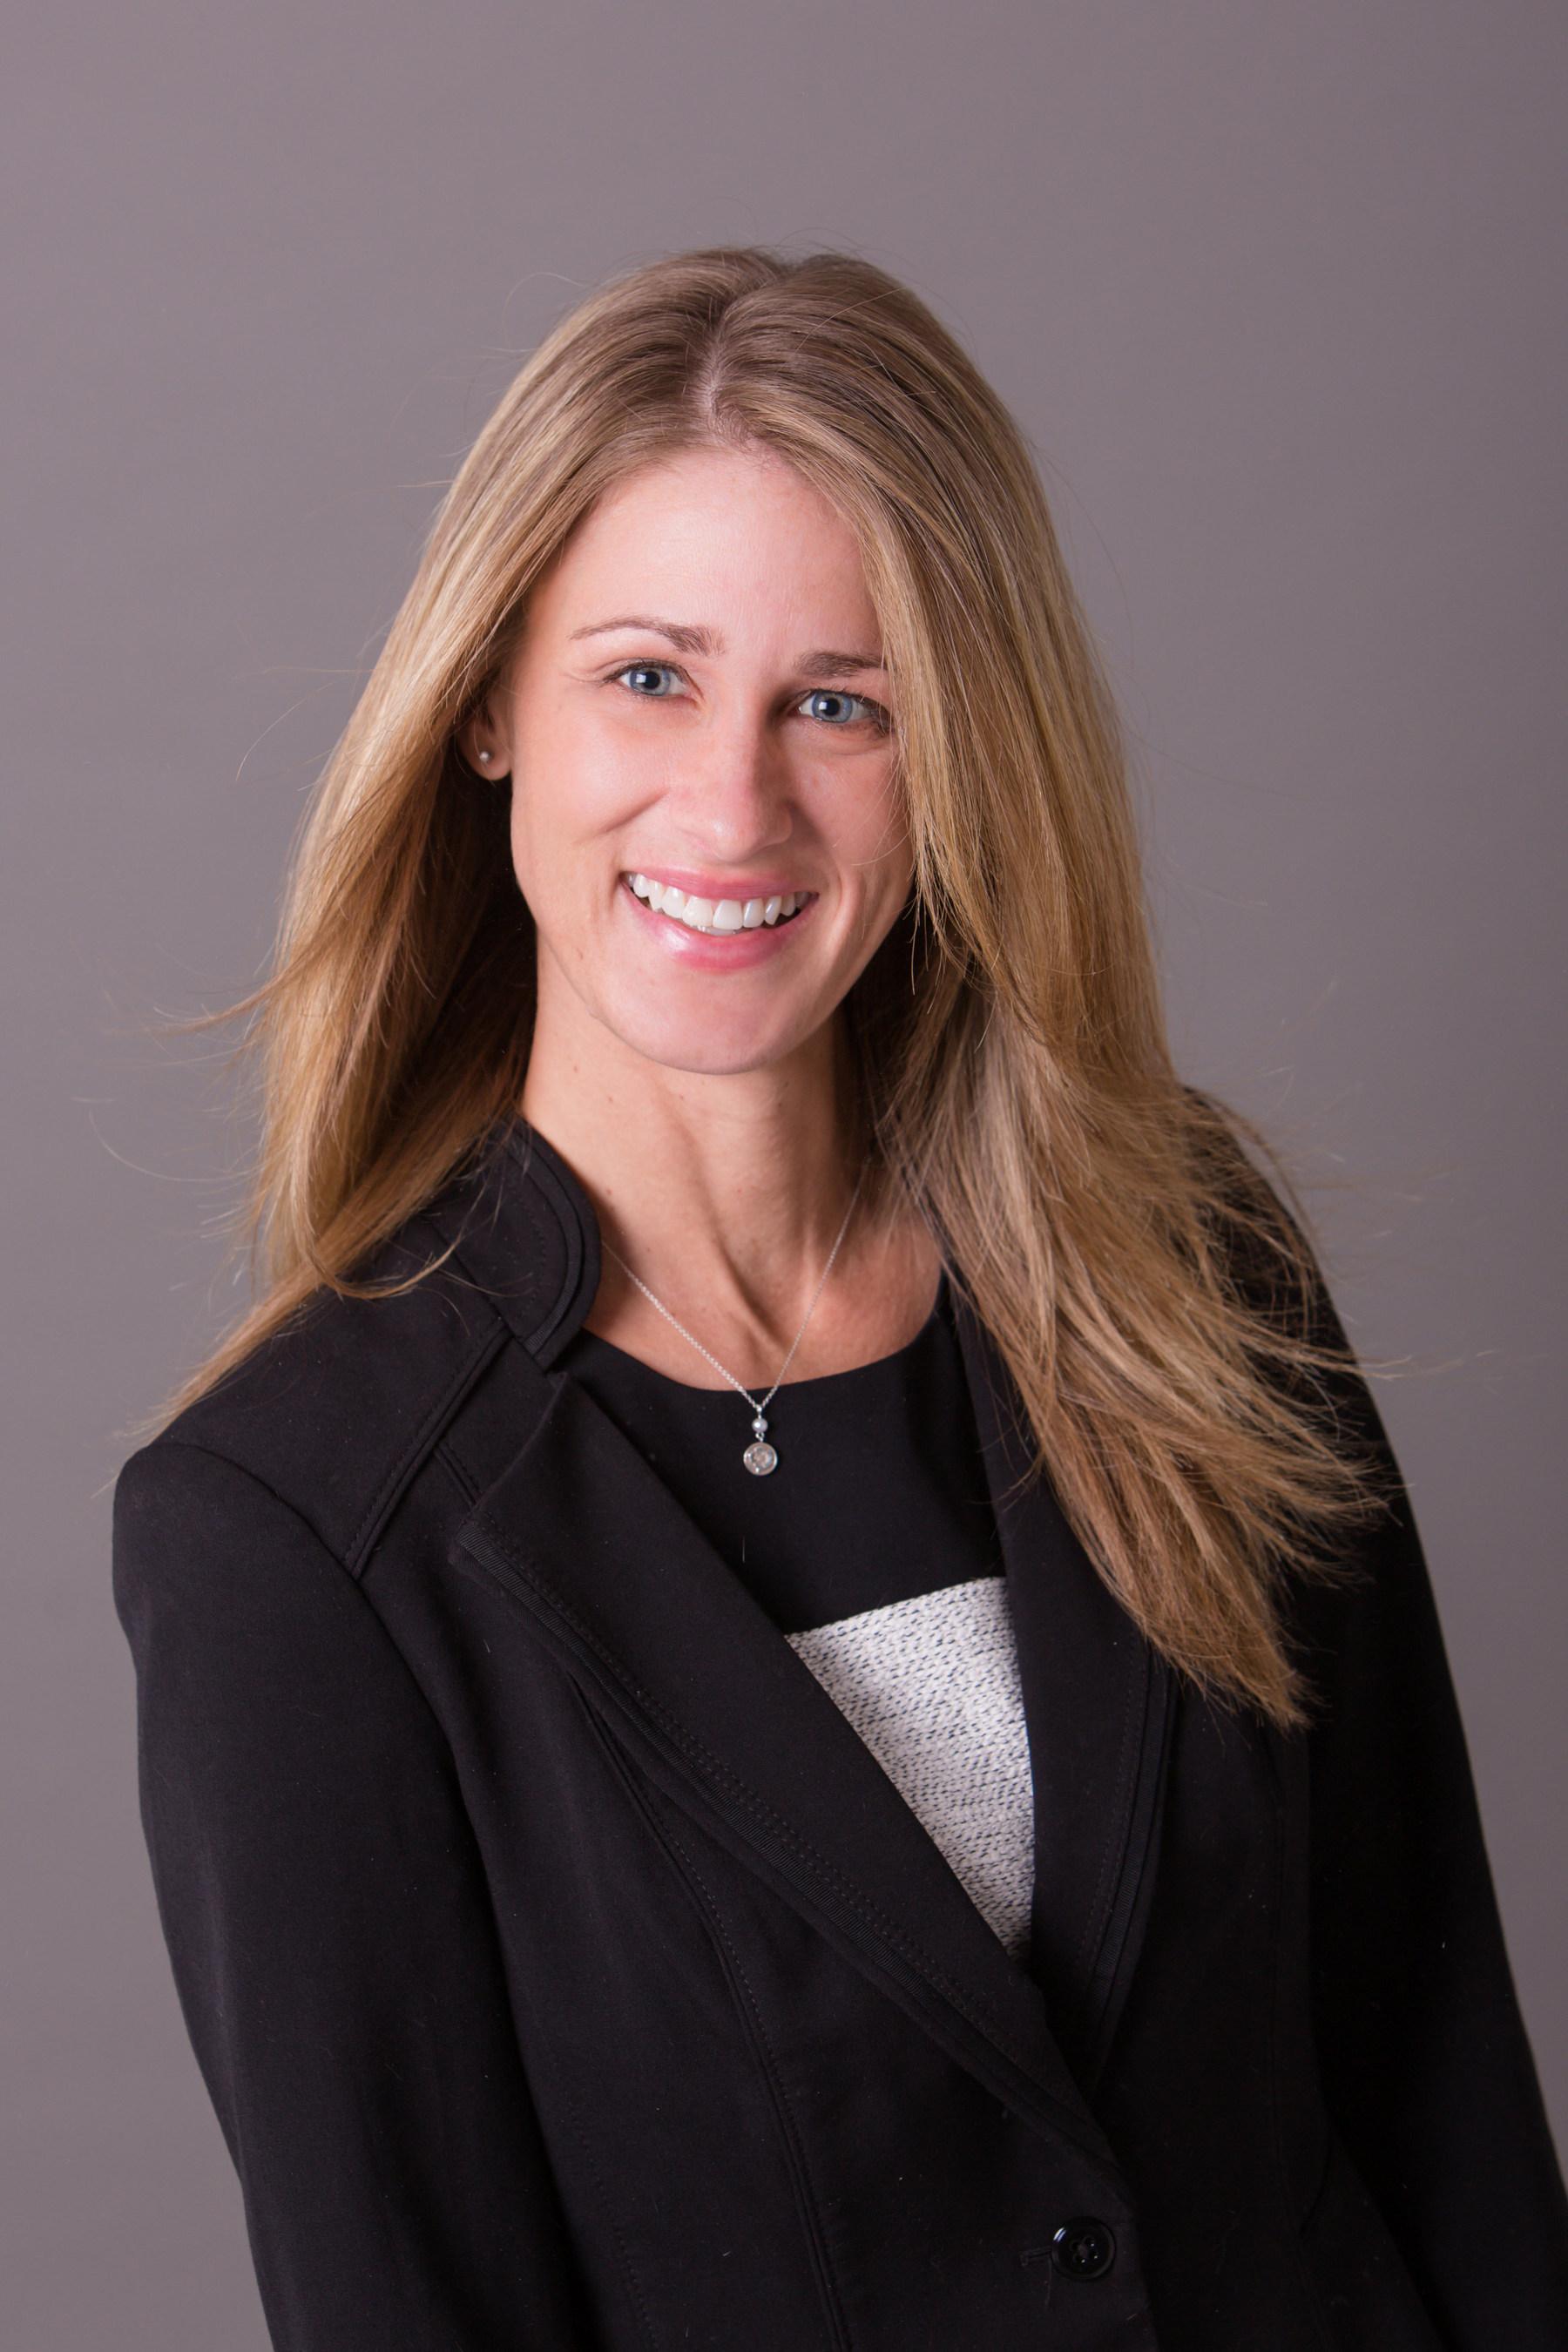 Jennifer Hagerman, Pharm D., Vice President, Education & Quality